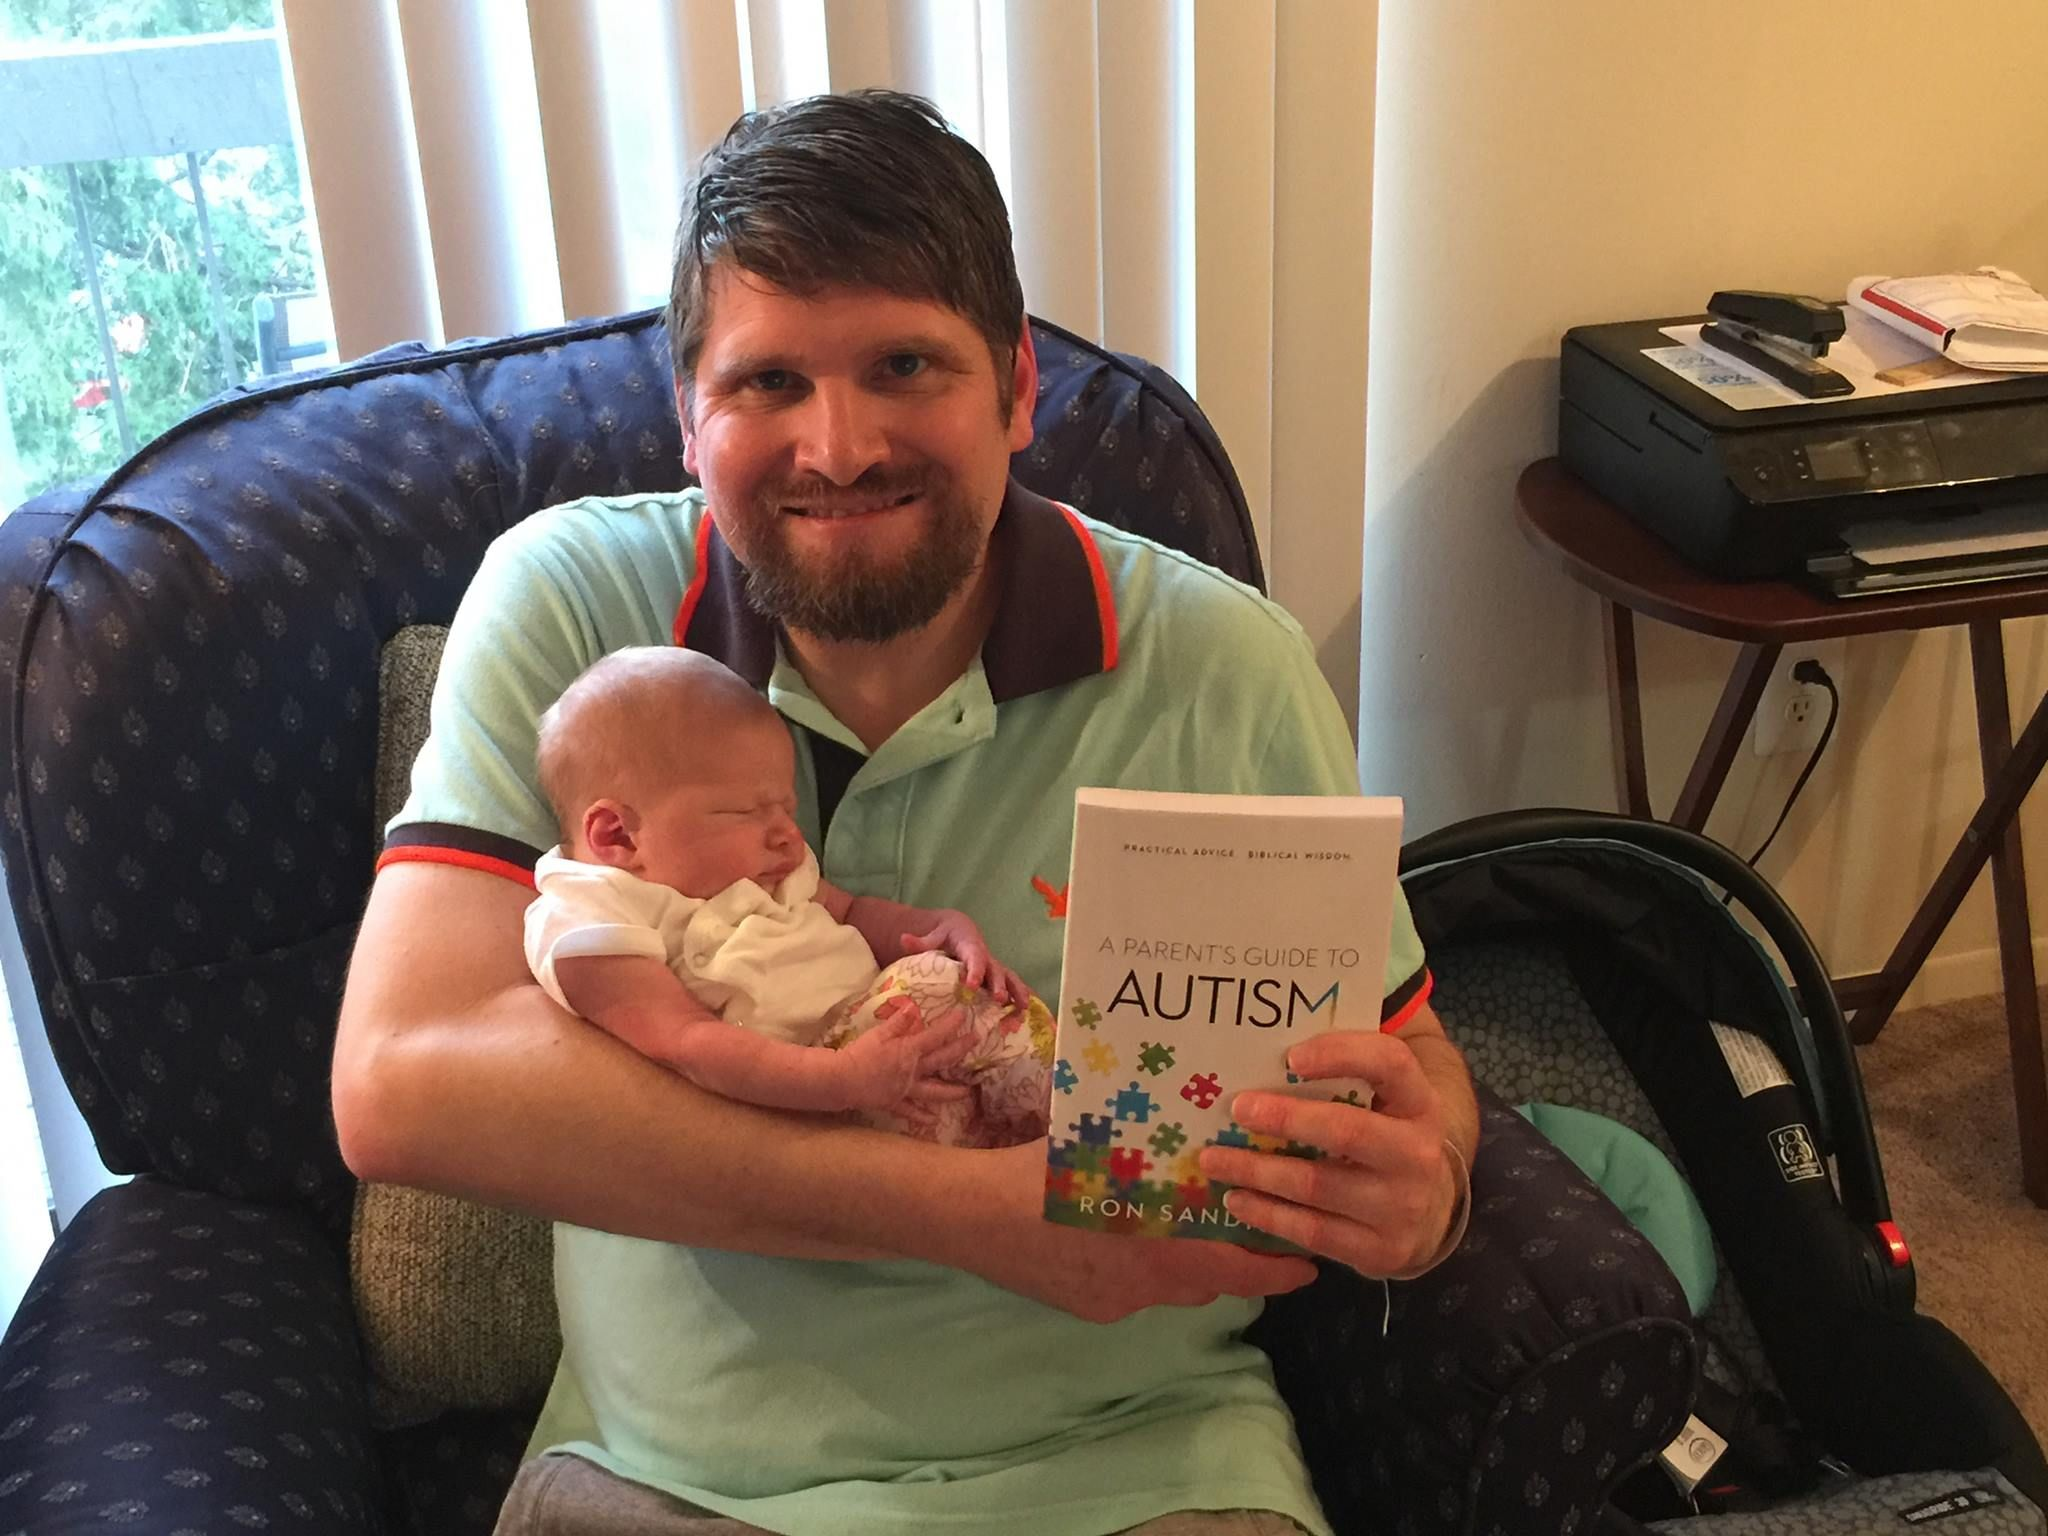 5 ways #autism makes me unique - http://the-art-of-autism.com/5-ways-autism-makes-me-unique/ #livingautismdaybyday #autismawareness